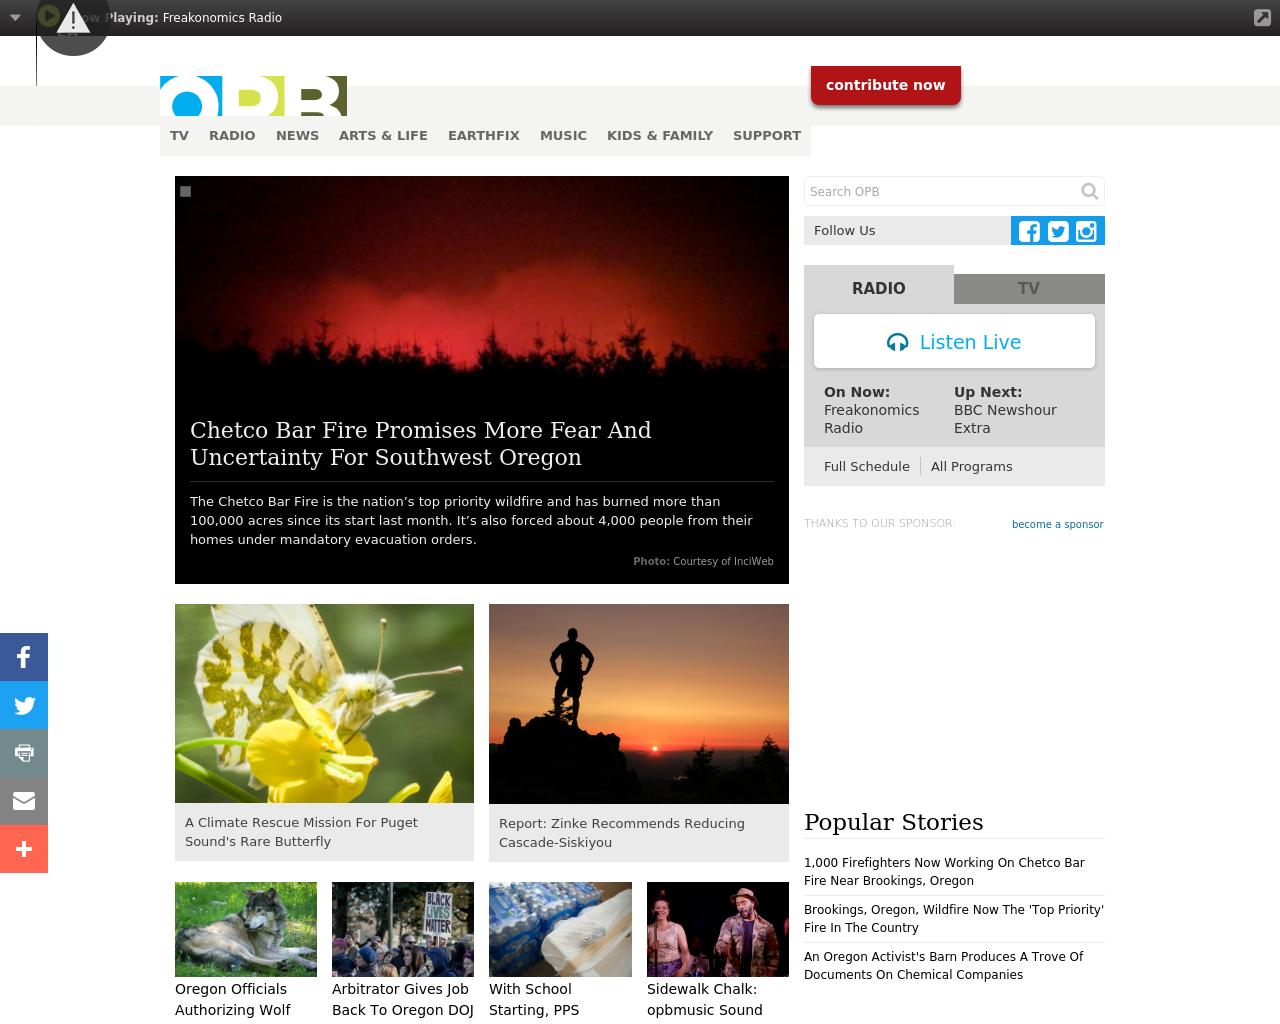 opb.org-Advertising-Reviews-Pricing